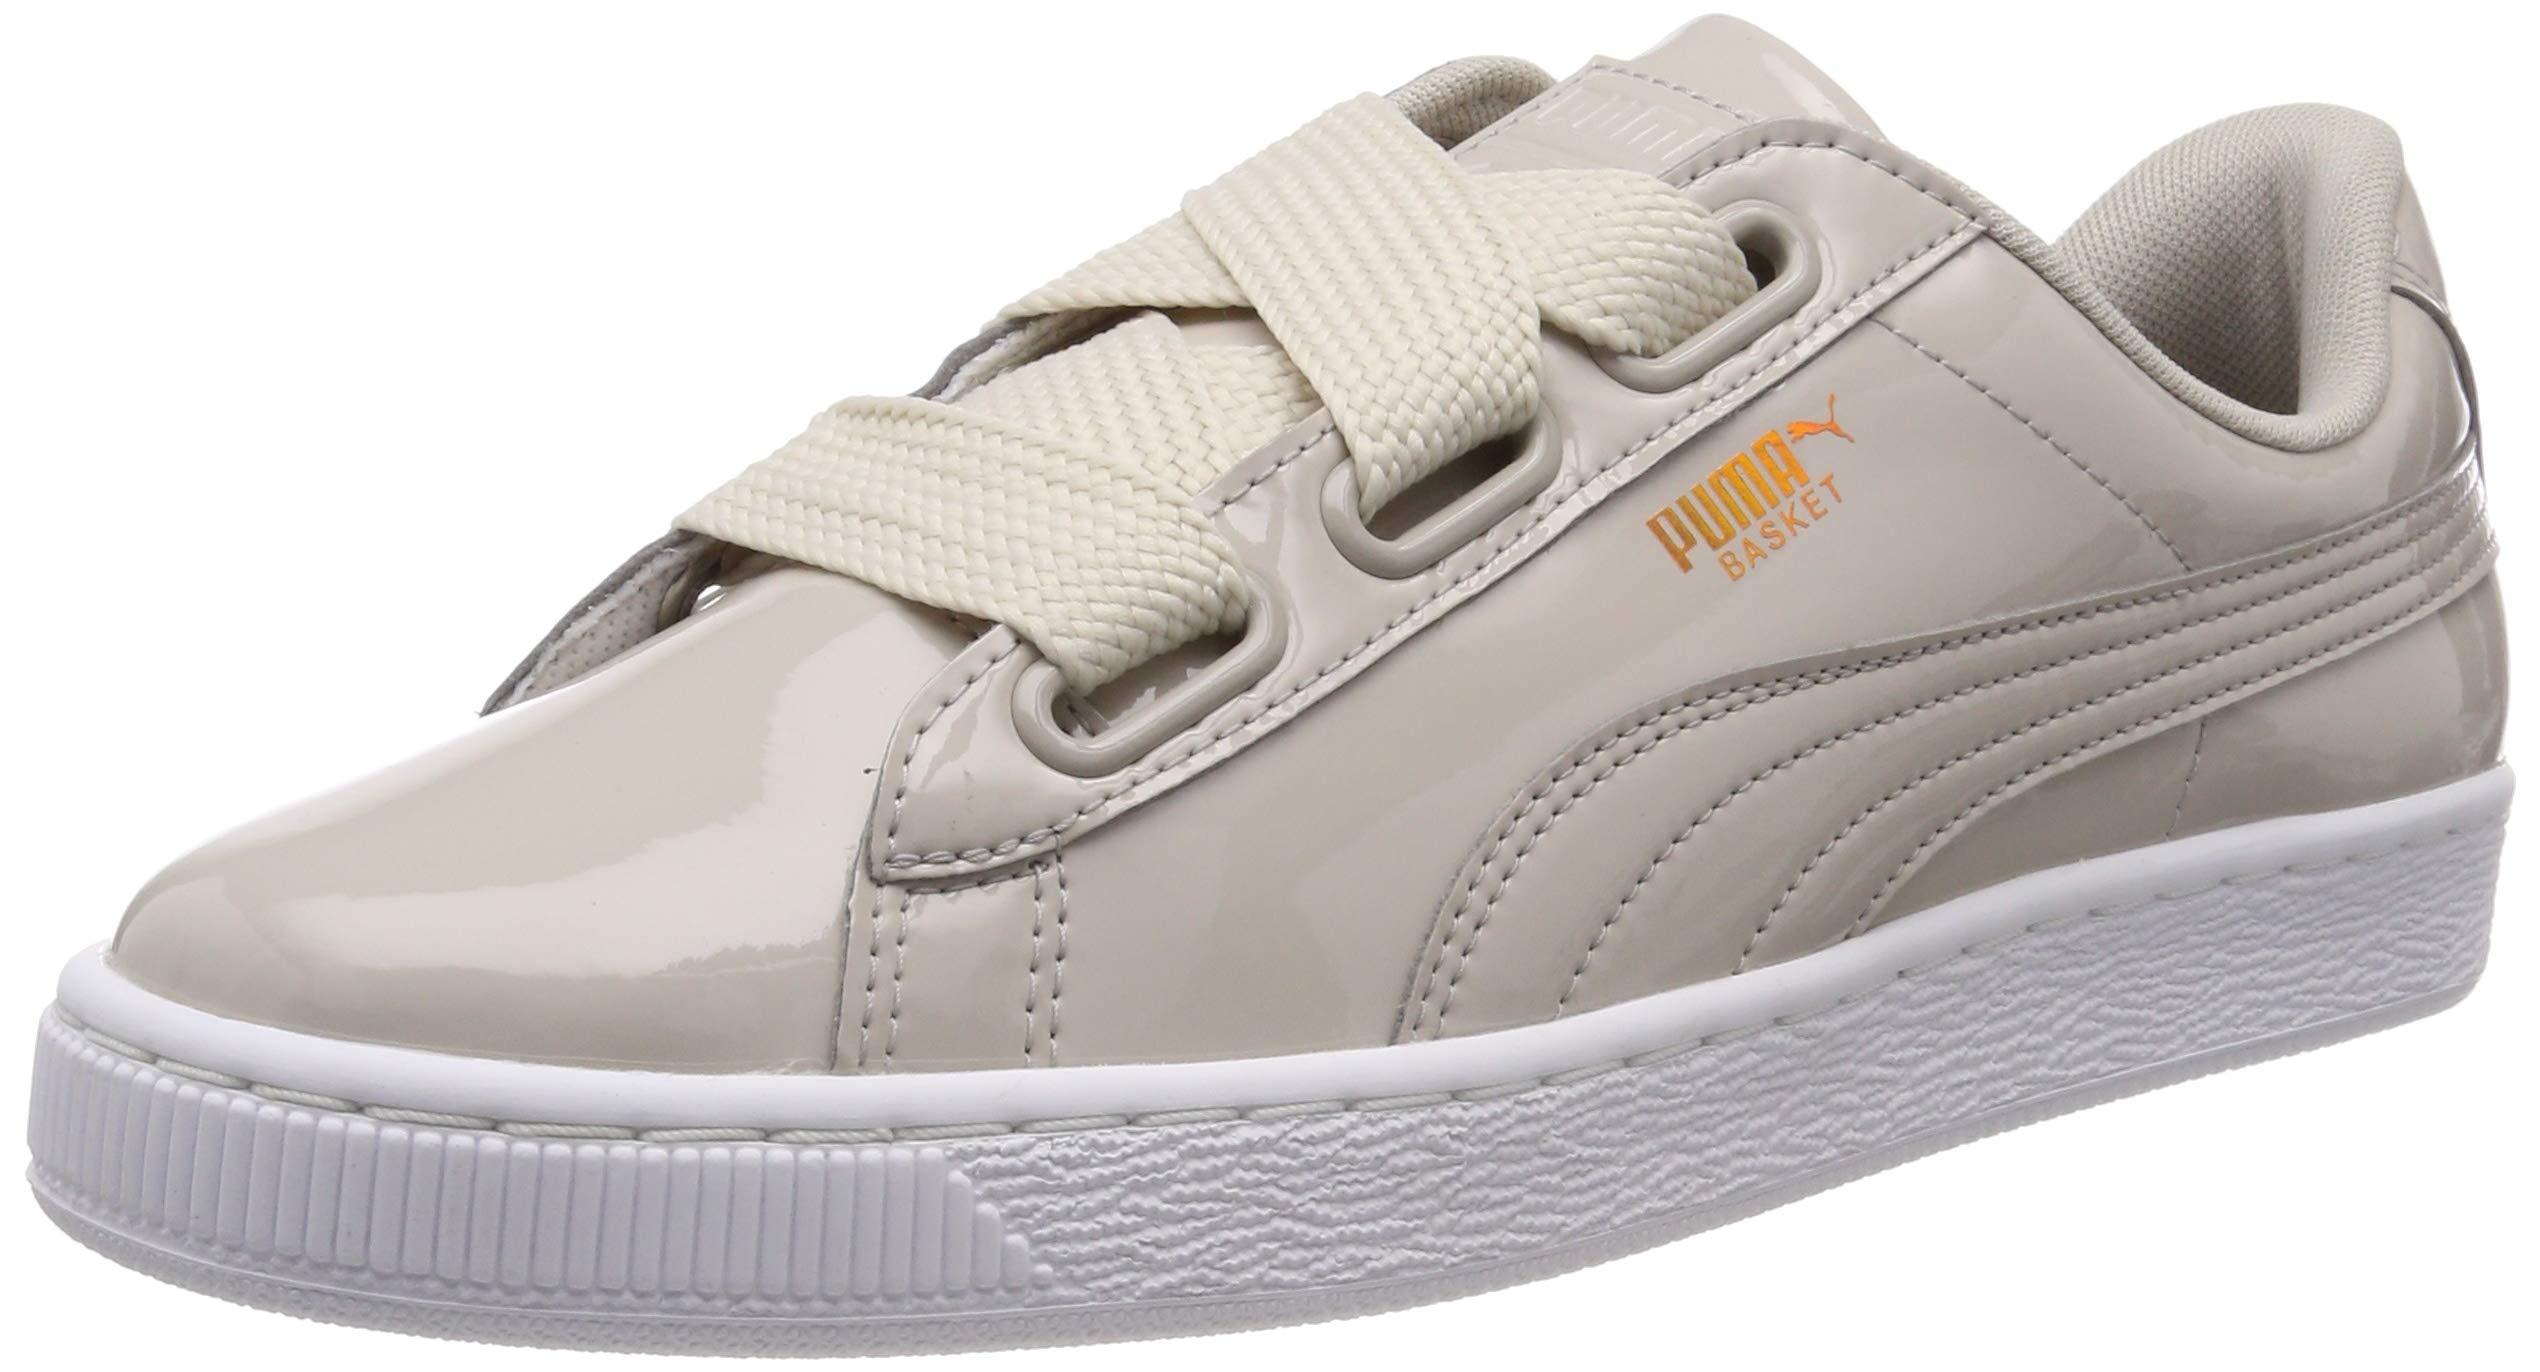 Basket Wn'sSneakers Femme Heart Basses Puma Patent SzMUqVp